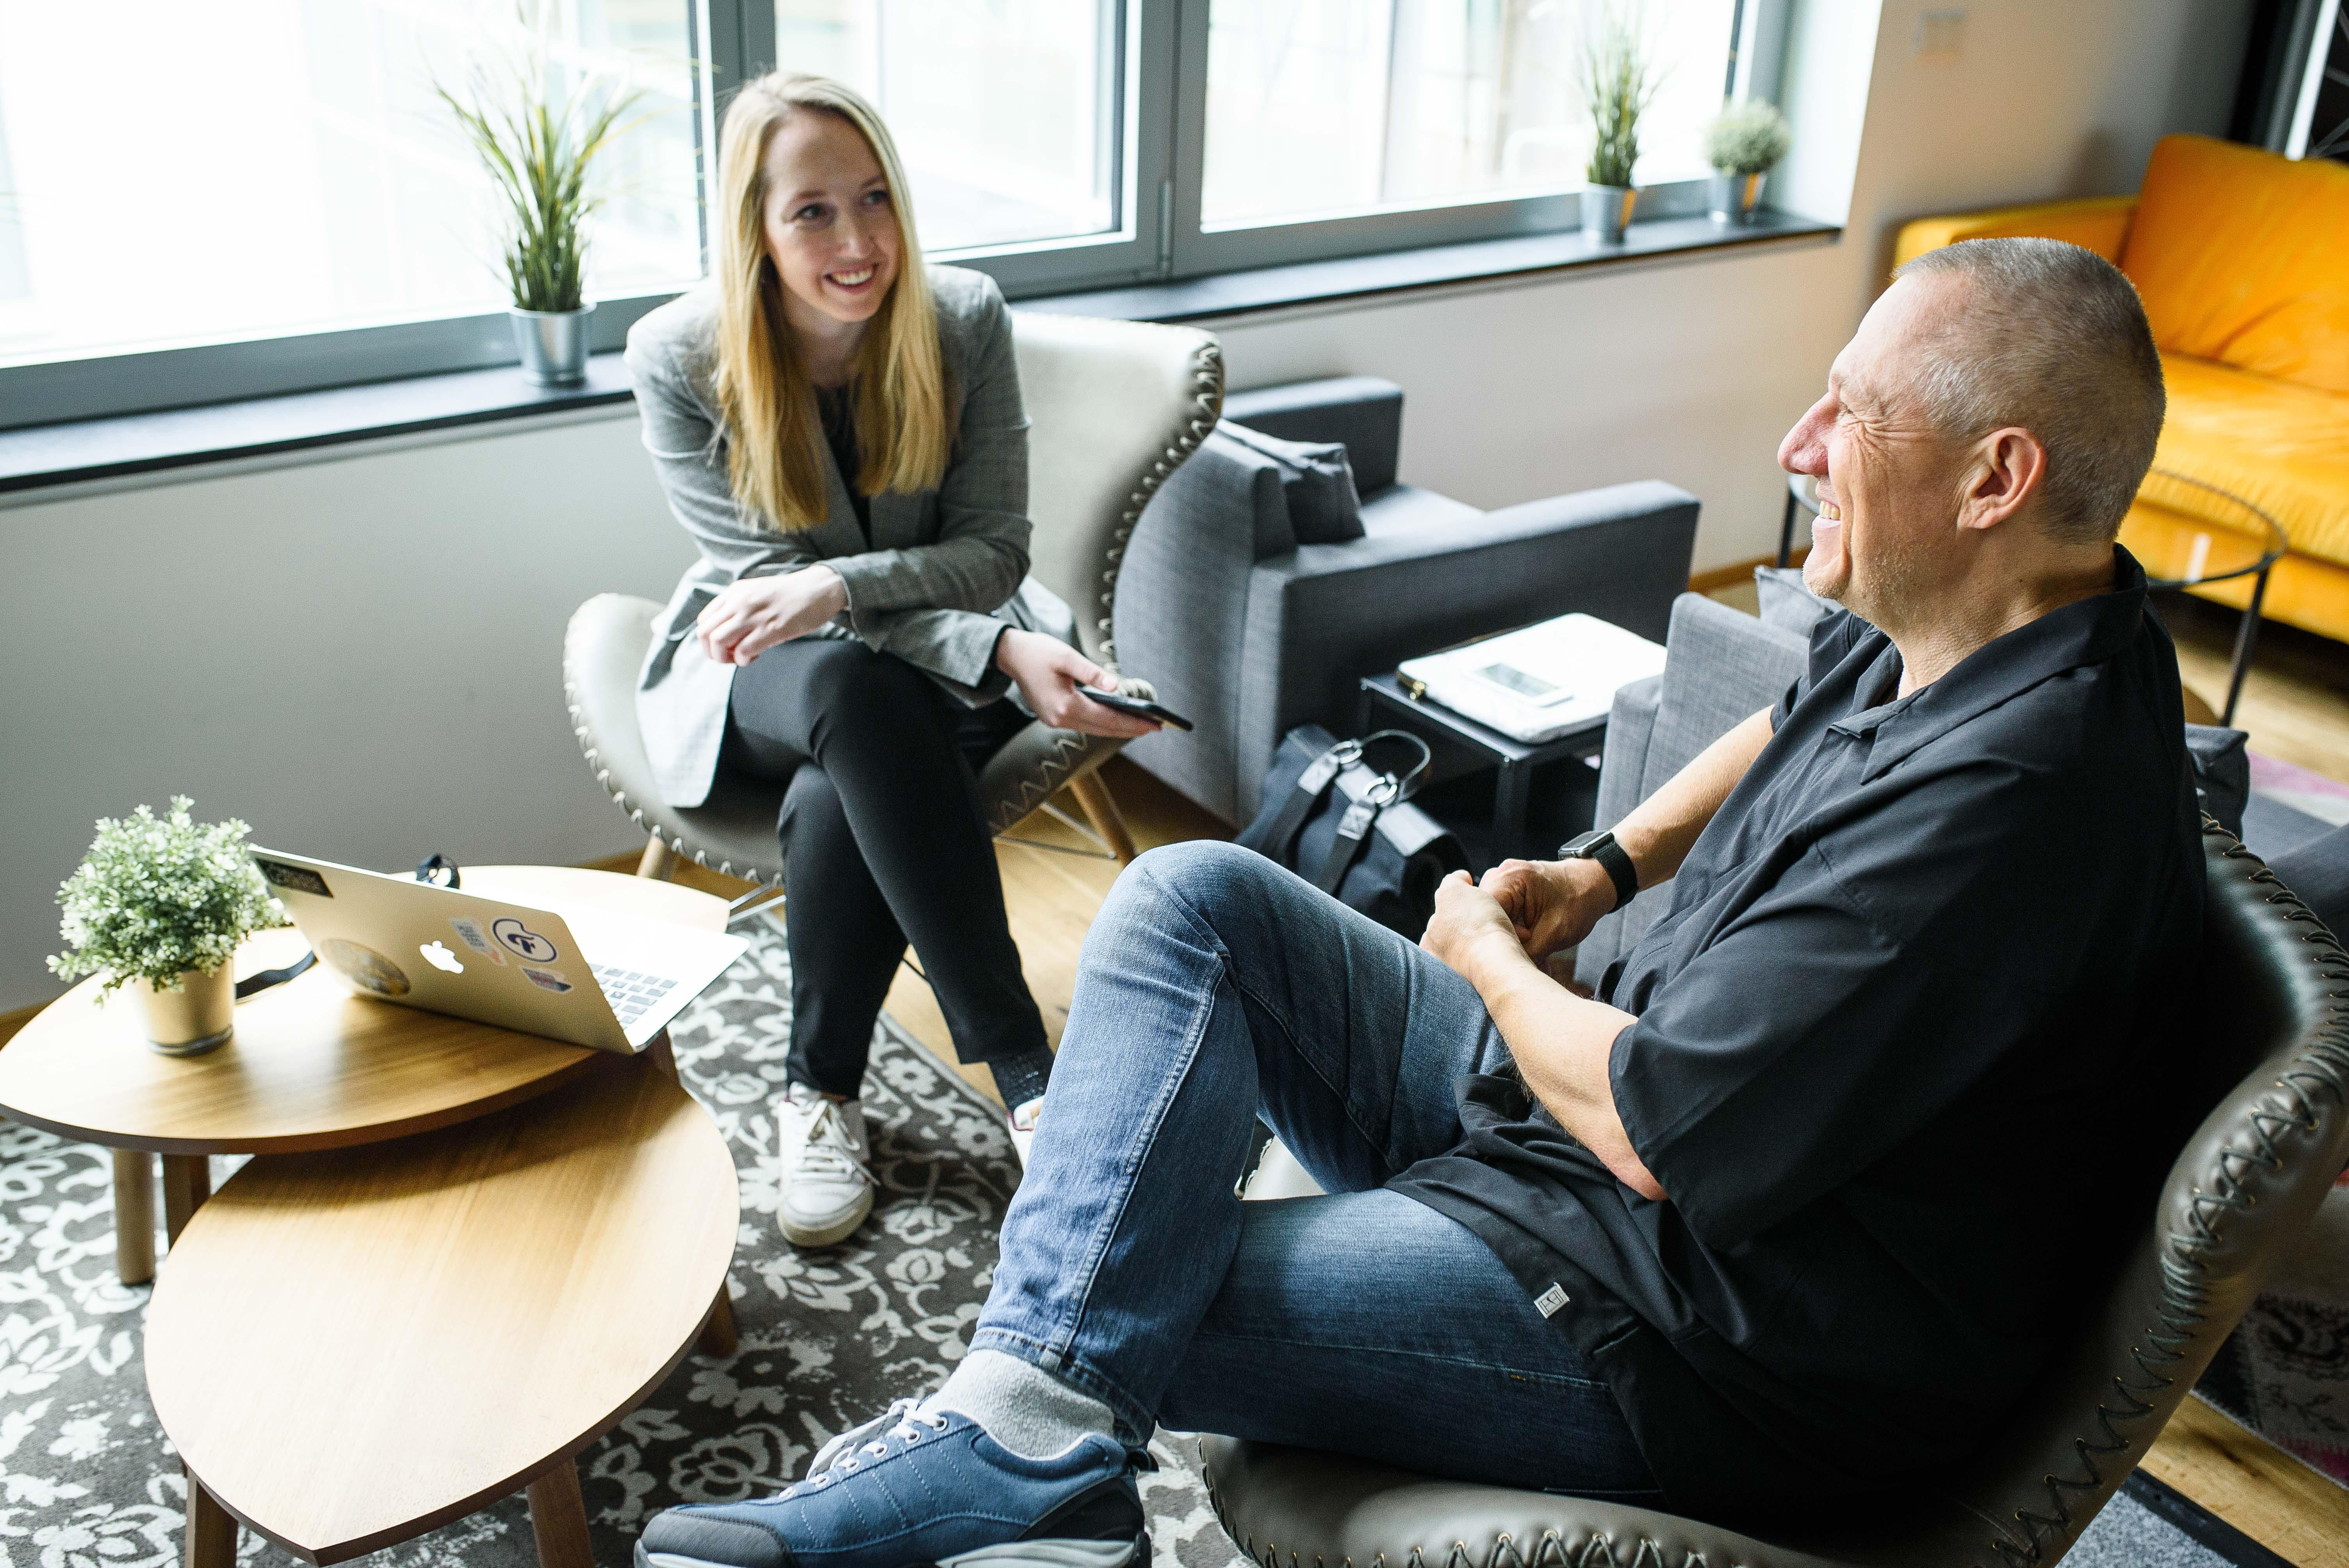 Michal Henych Z Firmy Trimcon V Rozhovoru Pro Coworking Worklounge